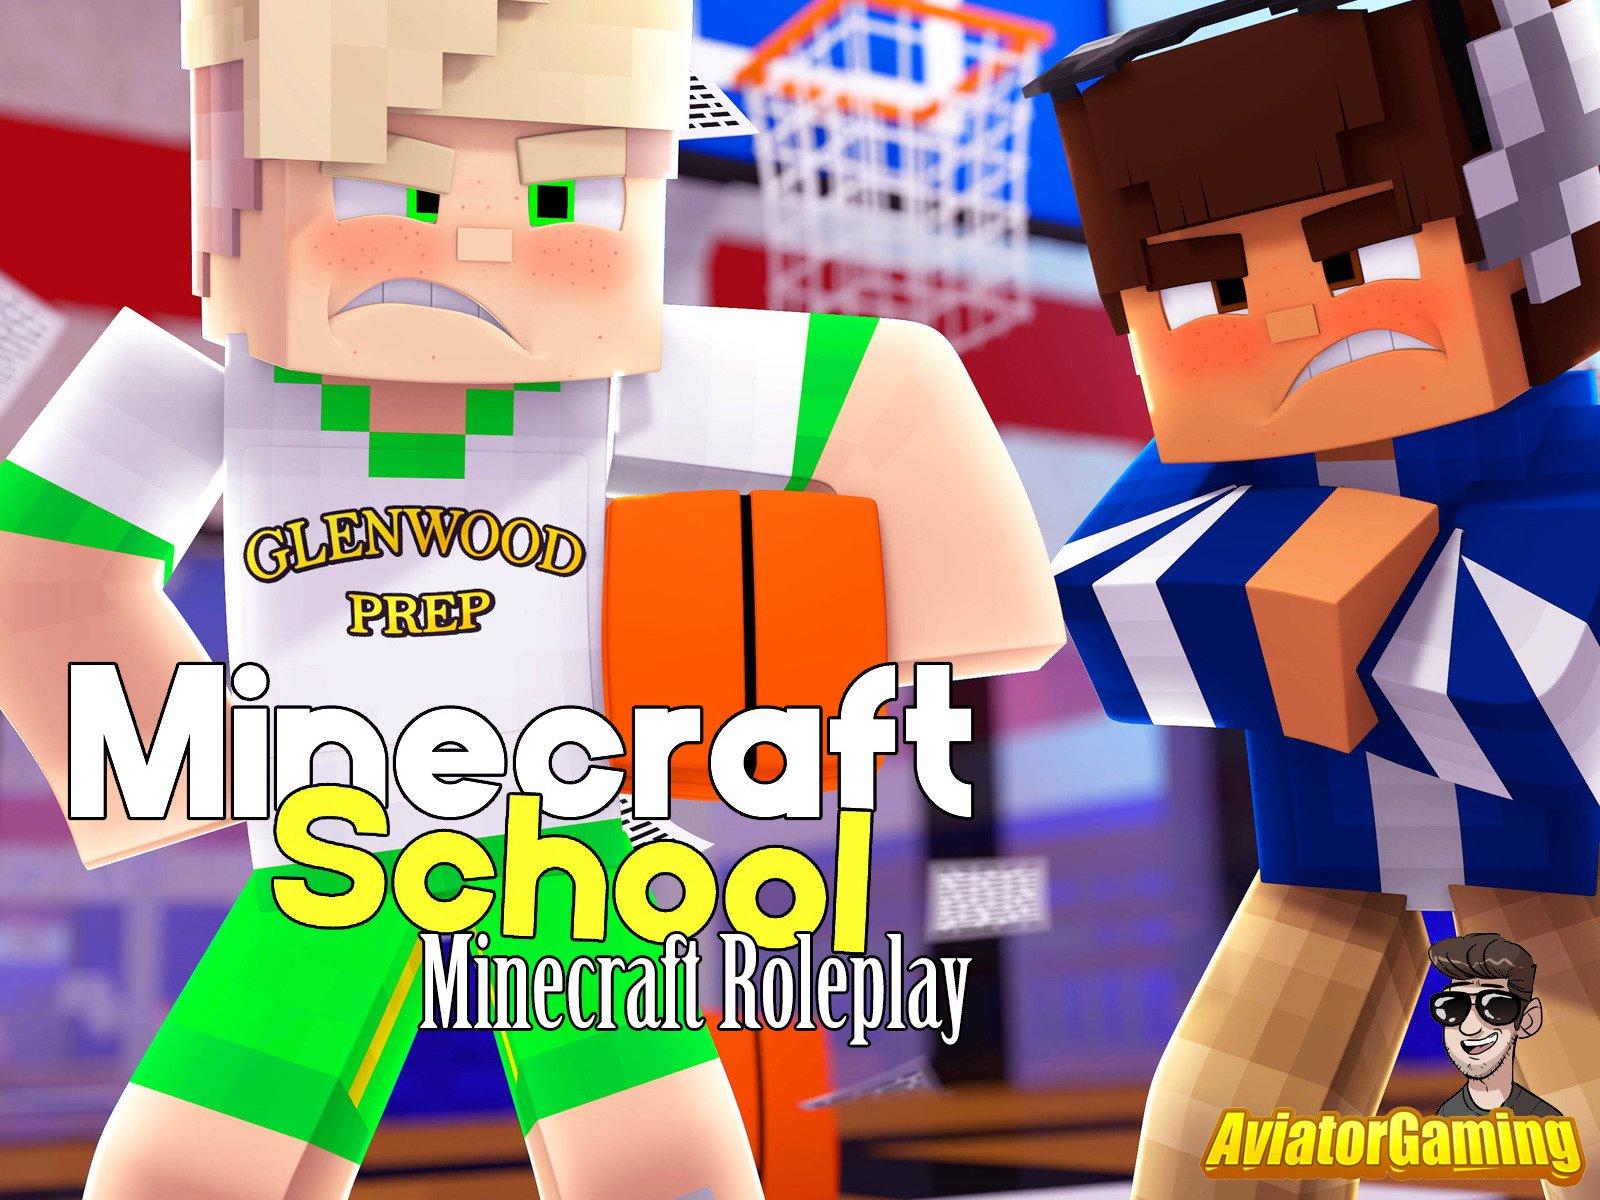 Glenwood Prep: Minecraft School (Minecraft Roleplay) - Season 1